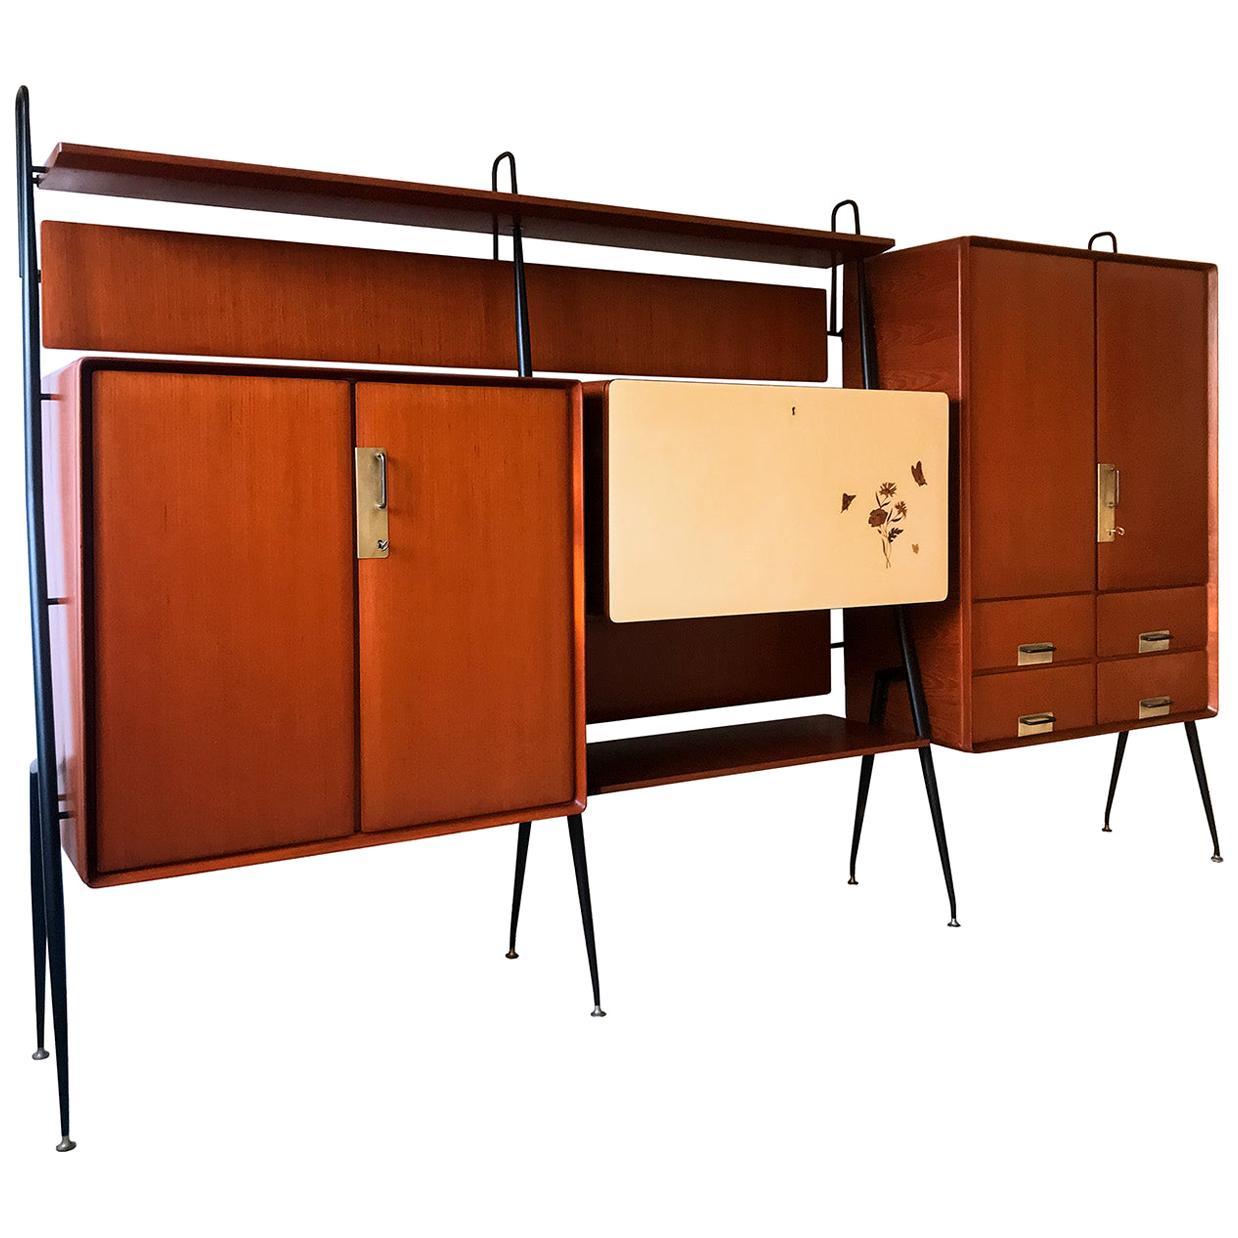 Italian Mid-Century Teakwood Sideboard by Silvio Cavatorta, 1950s